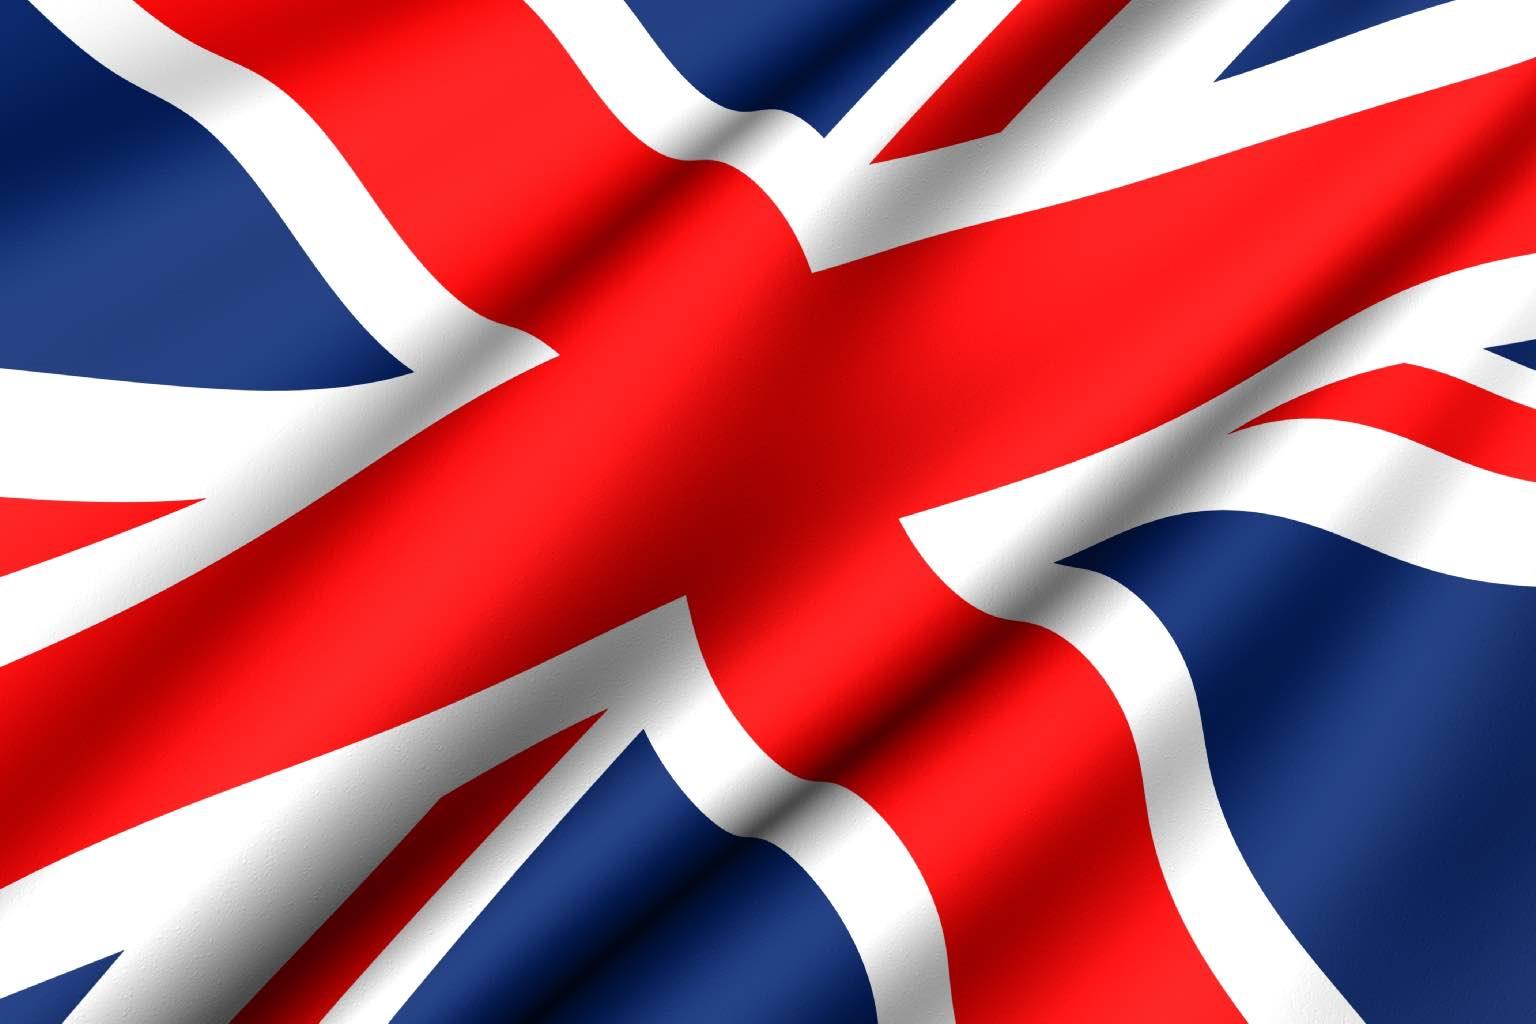 Rippling flag of the UK